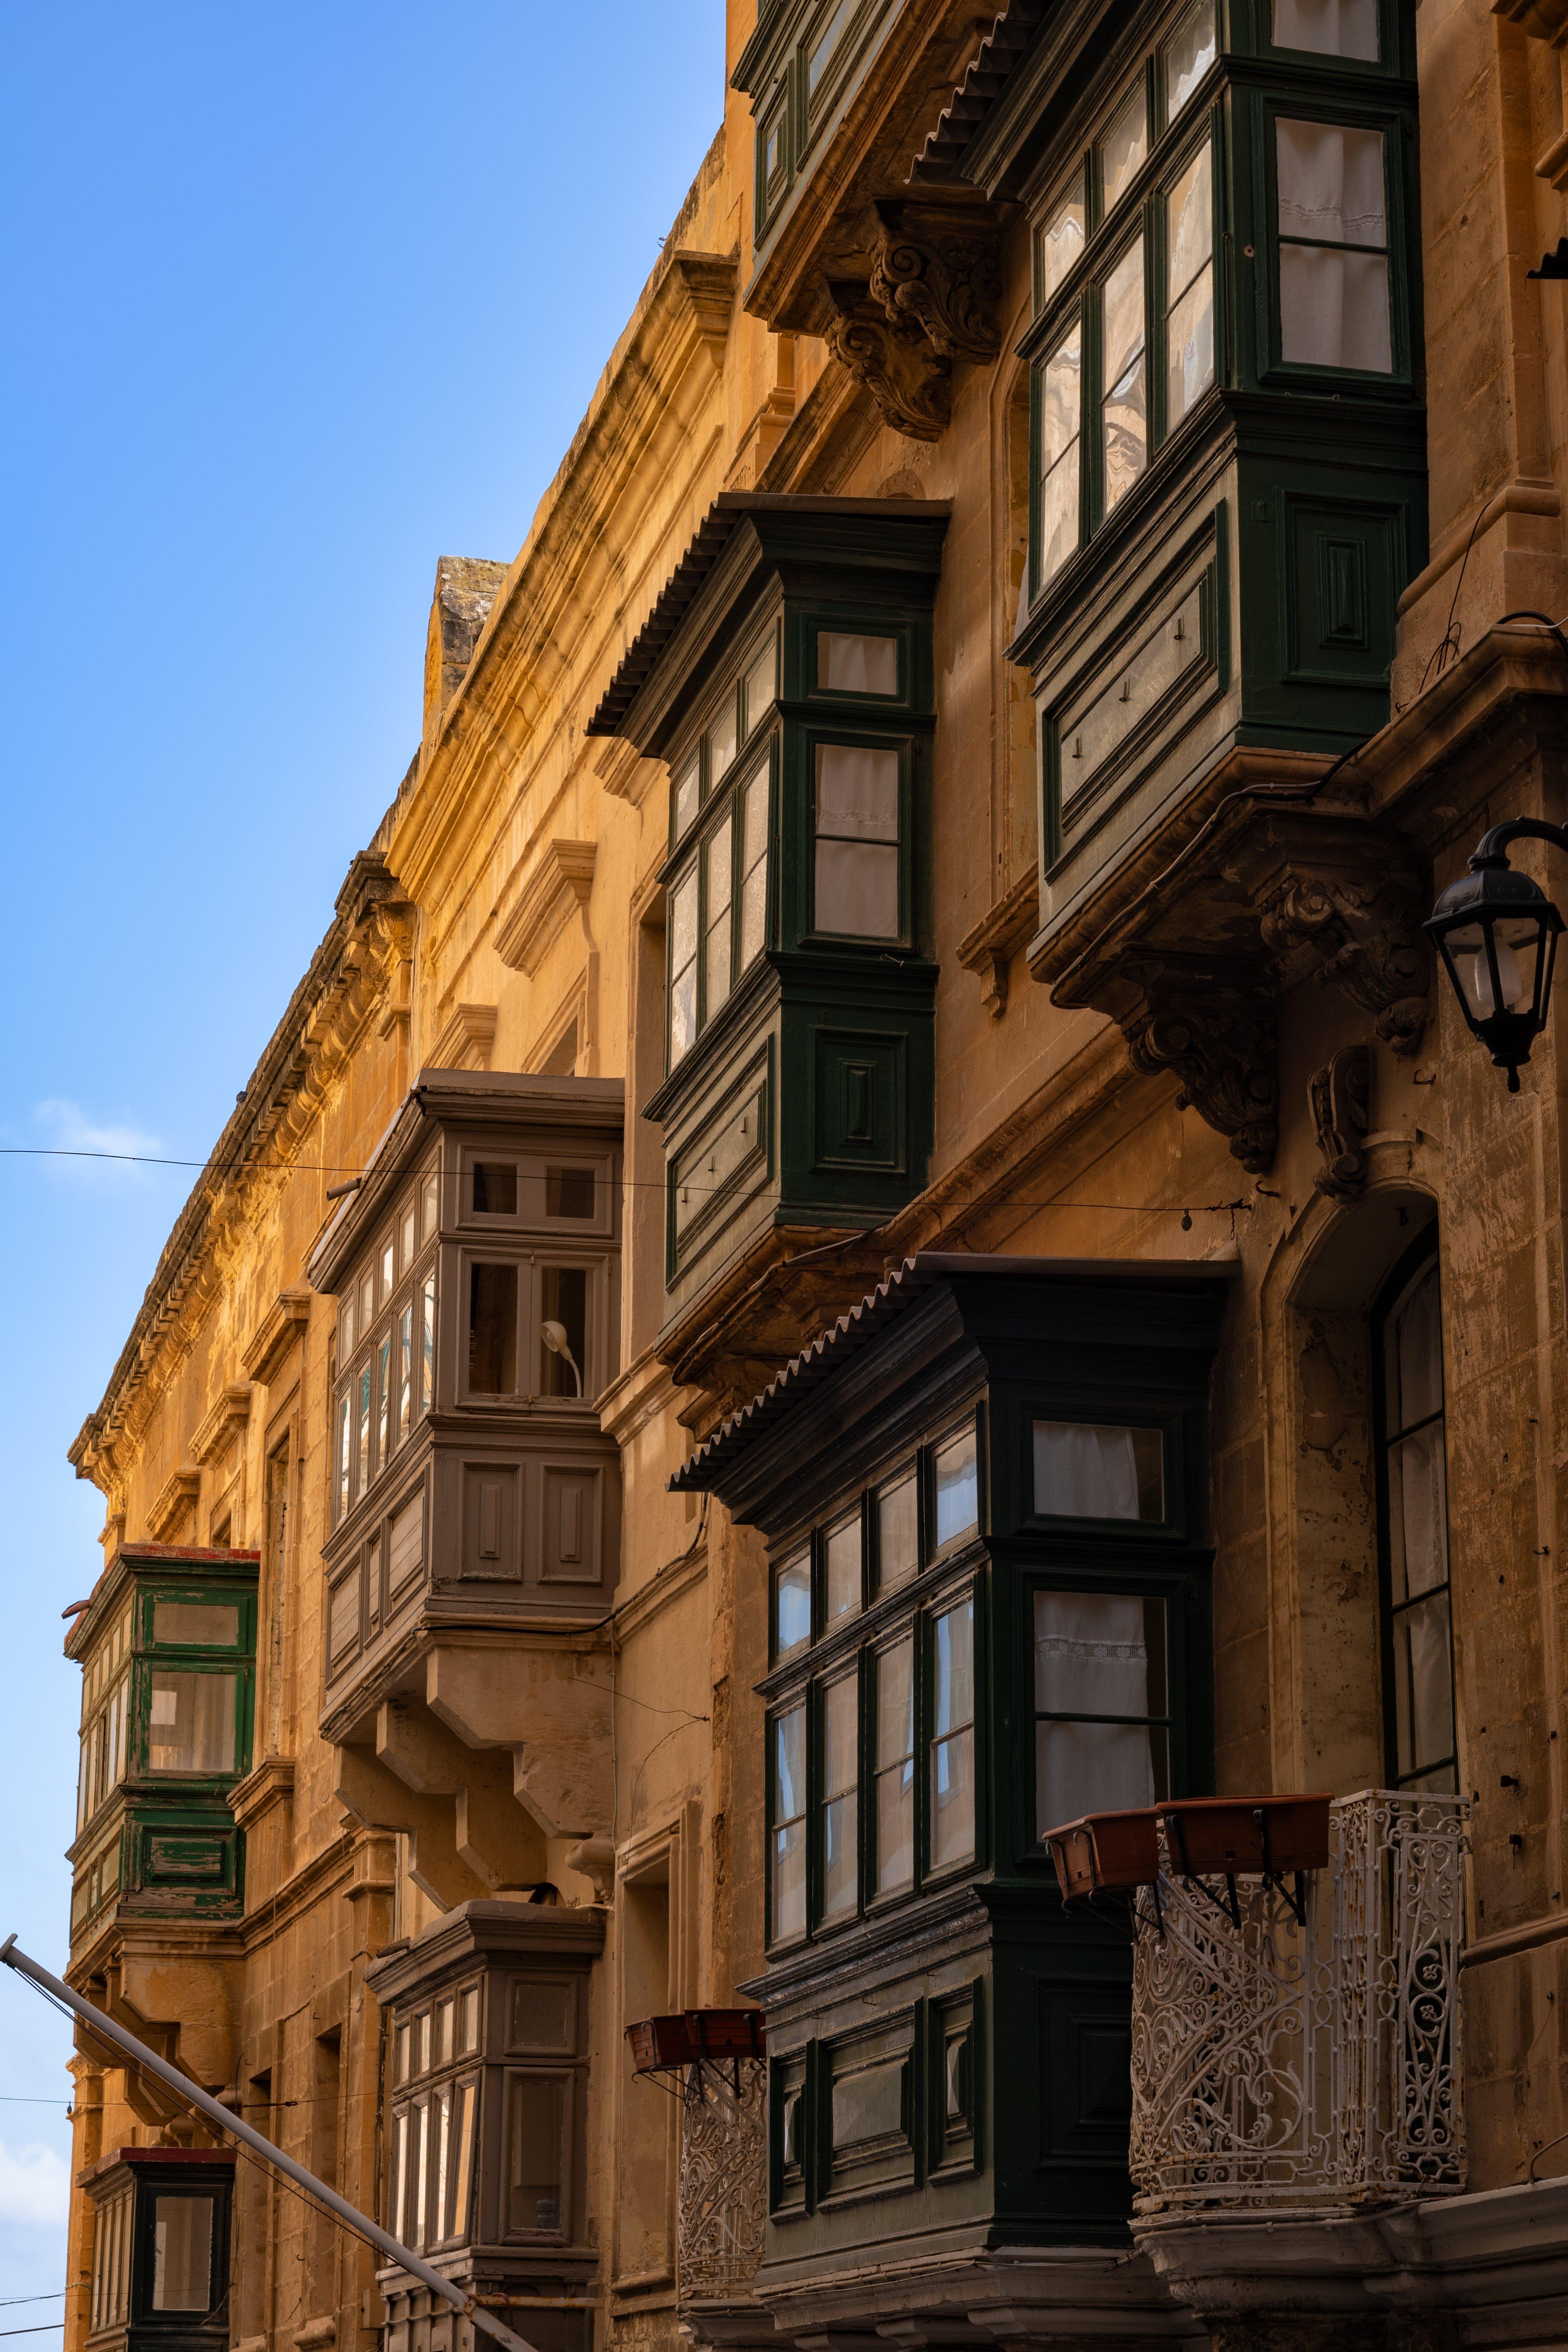 How To Convert Open Balcony Into A Room Homelane Blog